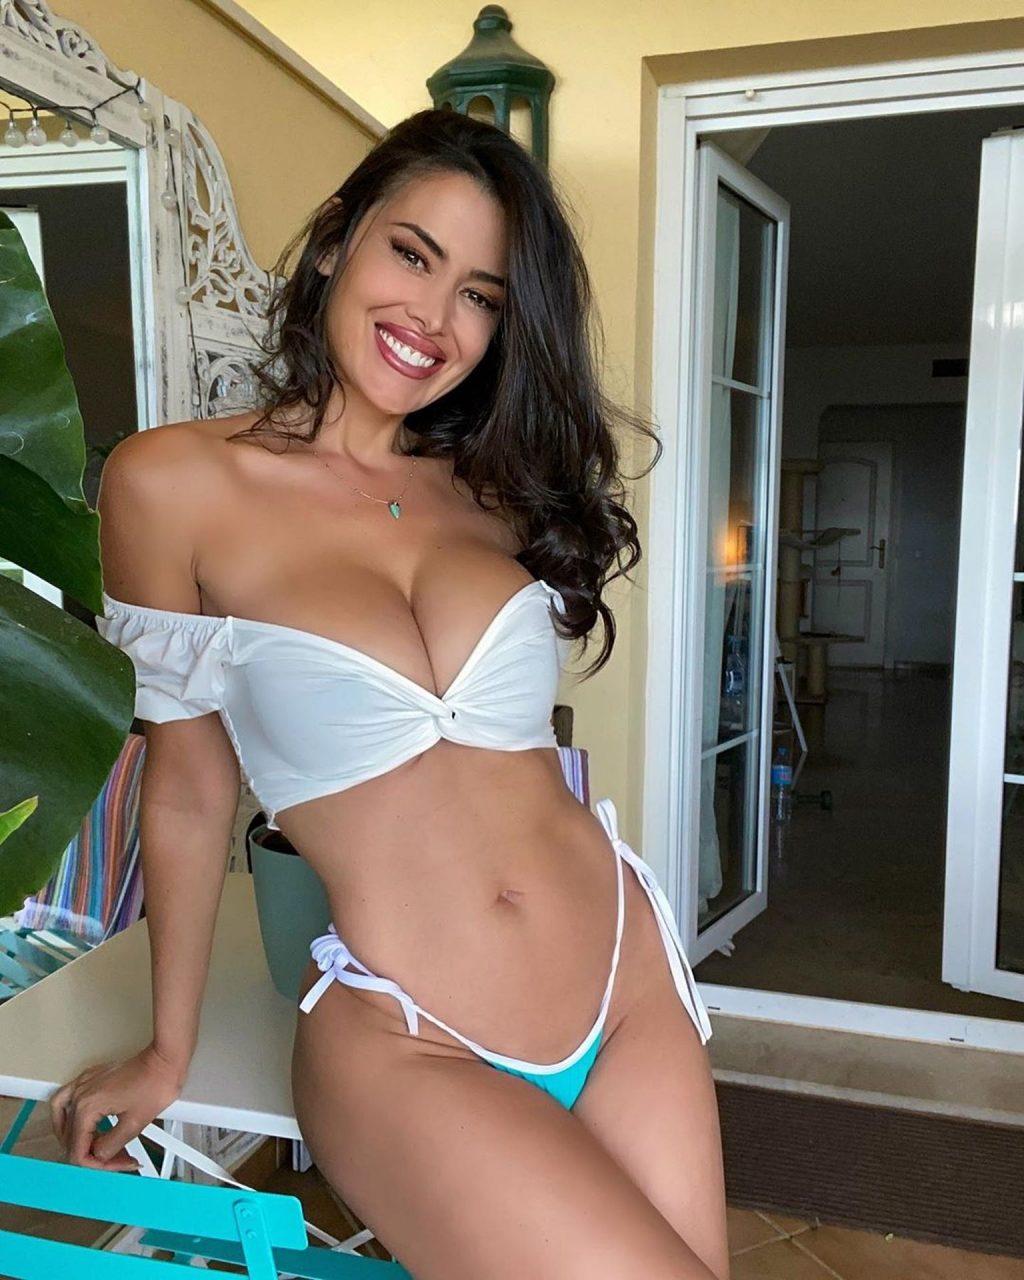 Eva Padlock Sexy (9 Photos)